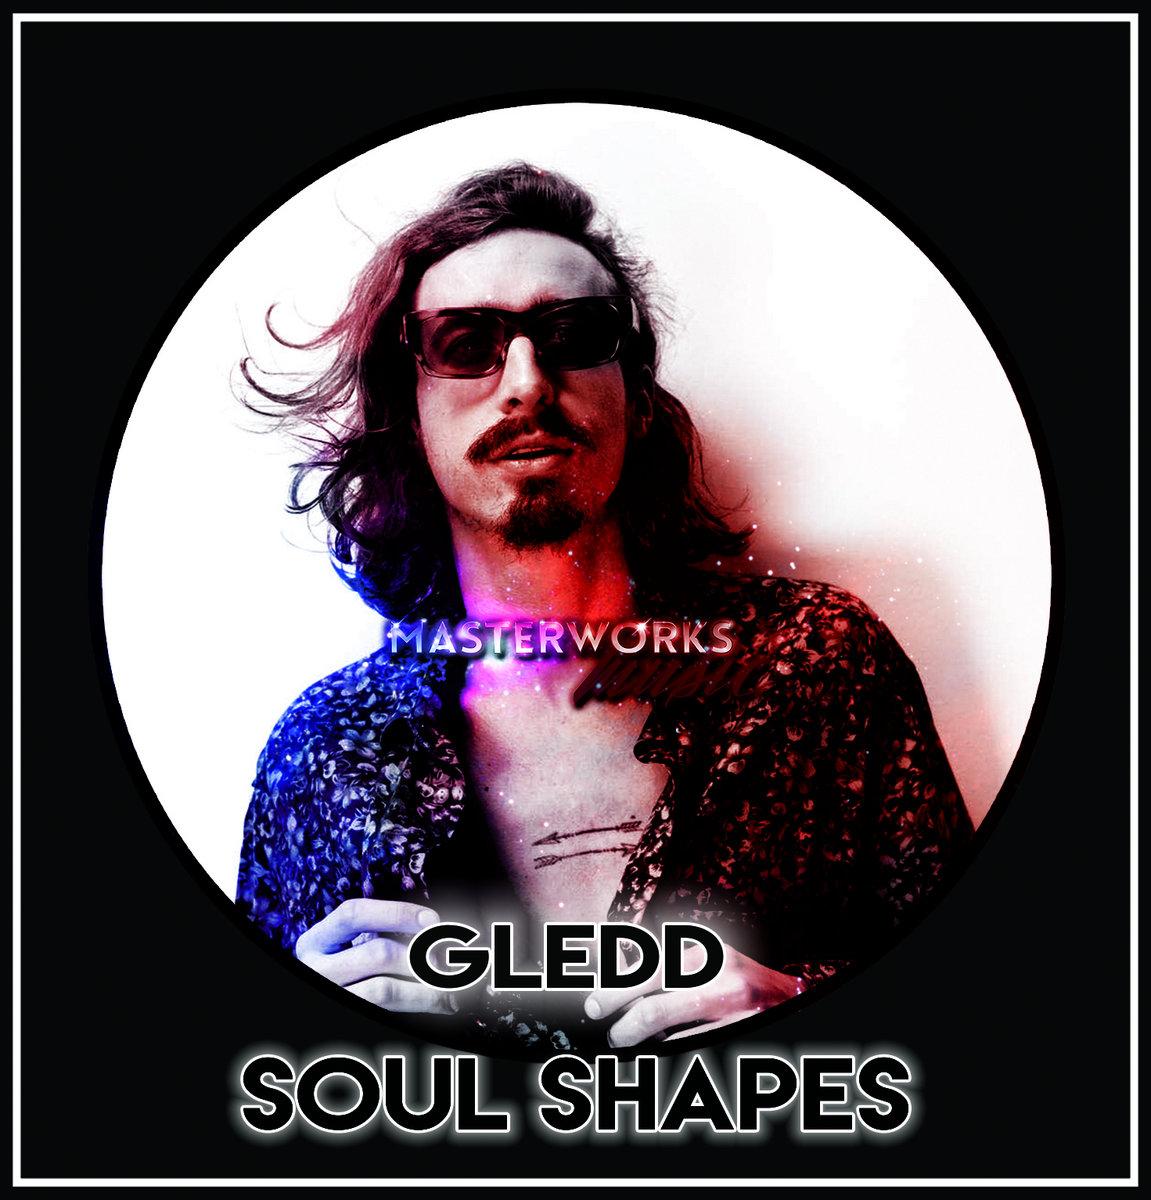 Gledd - Soul Shapes | 80s Child - Masterworks Music